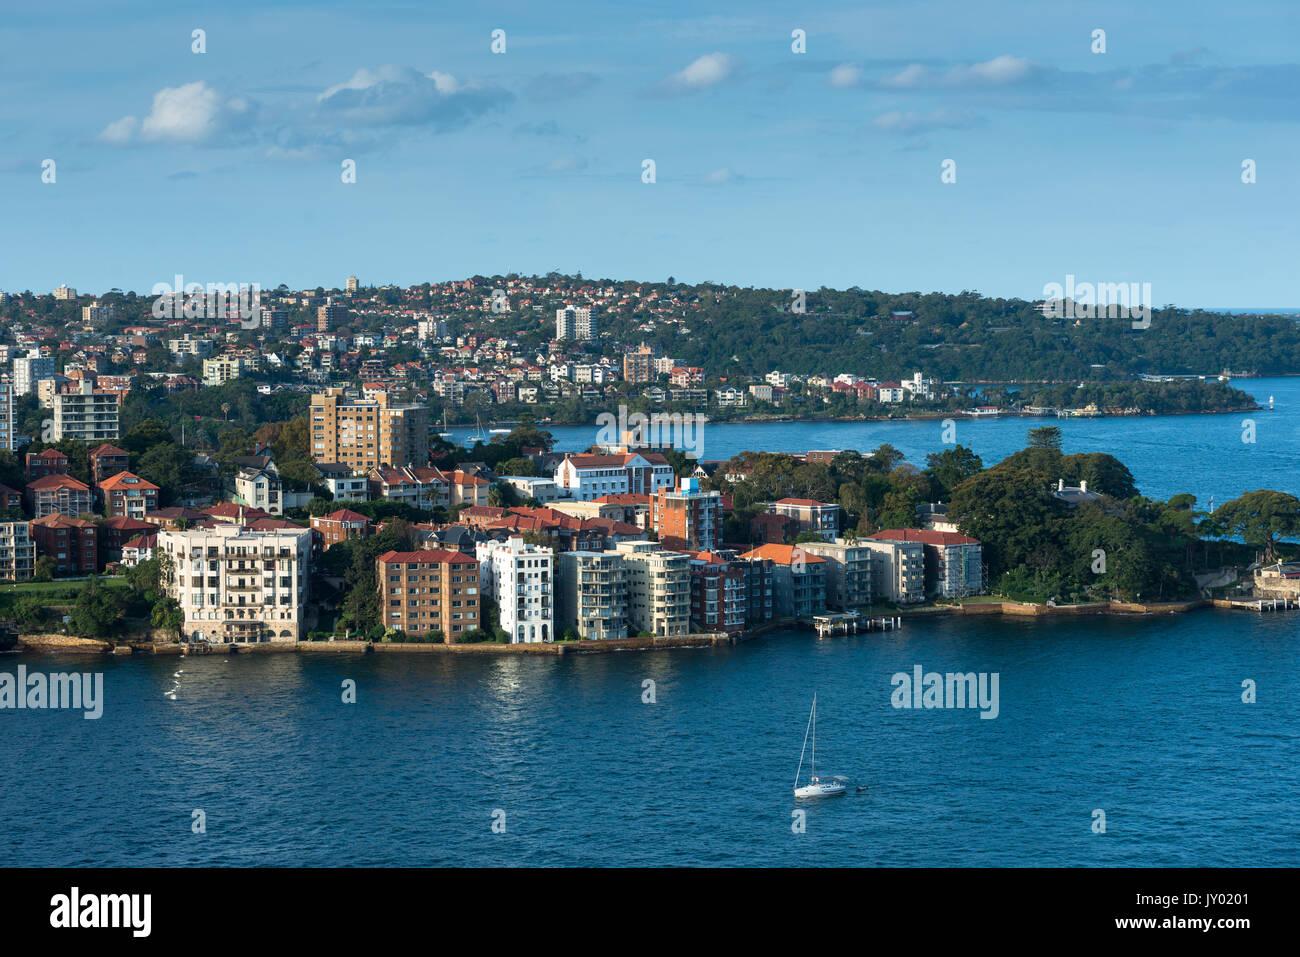 Views of Northern suburb of Kirribilli and beyond, seen from Sydney Harbour bridge. Sydney, Australia. - Stock Image